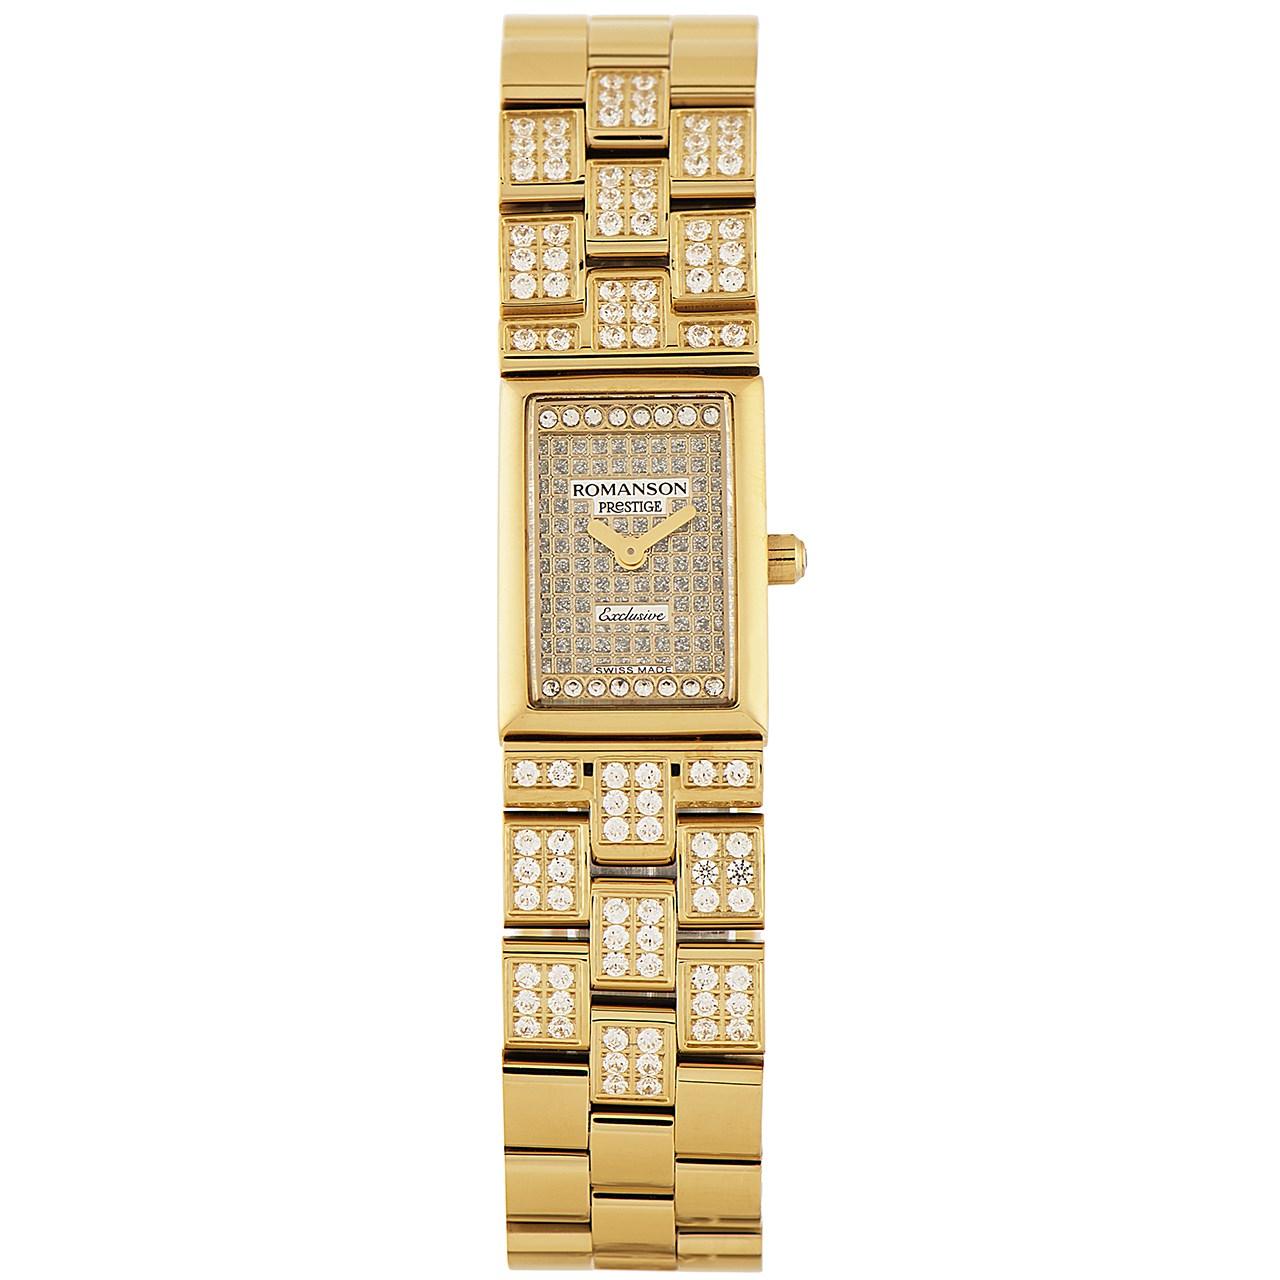 ساعت زنانه برند رومانسون مدل RM3255QL1GAS1G